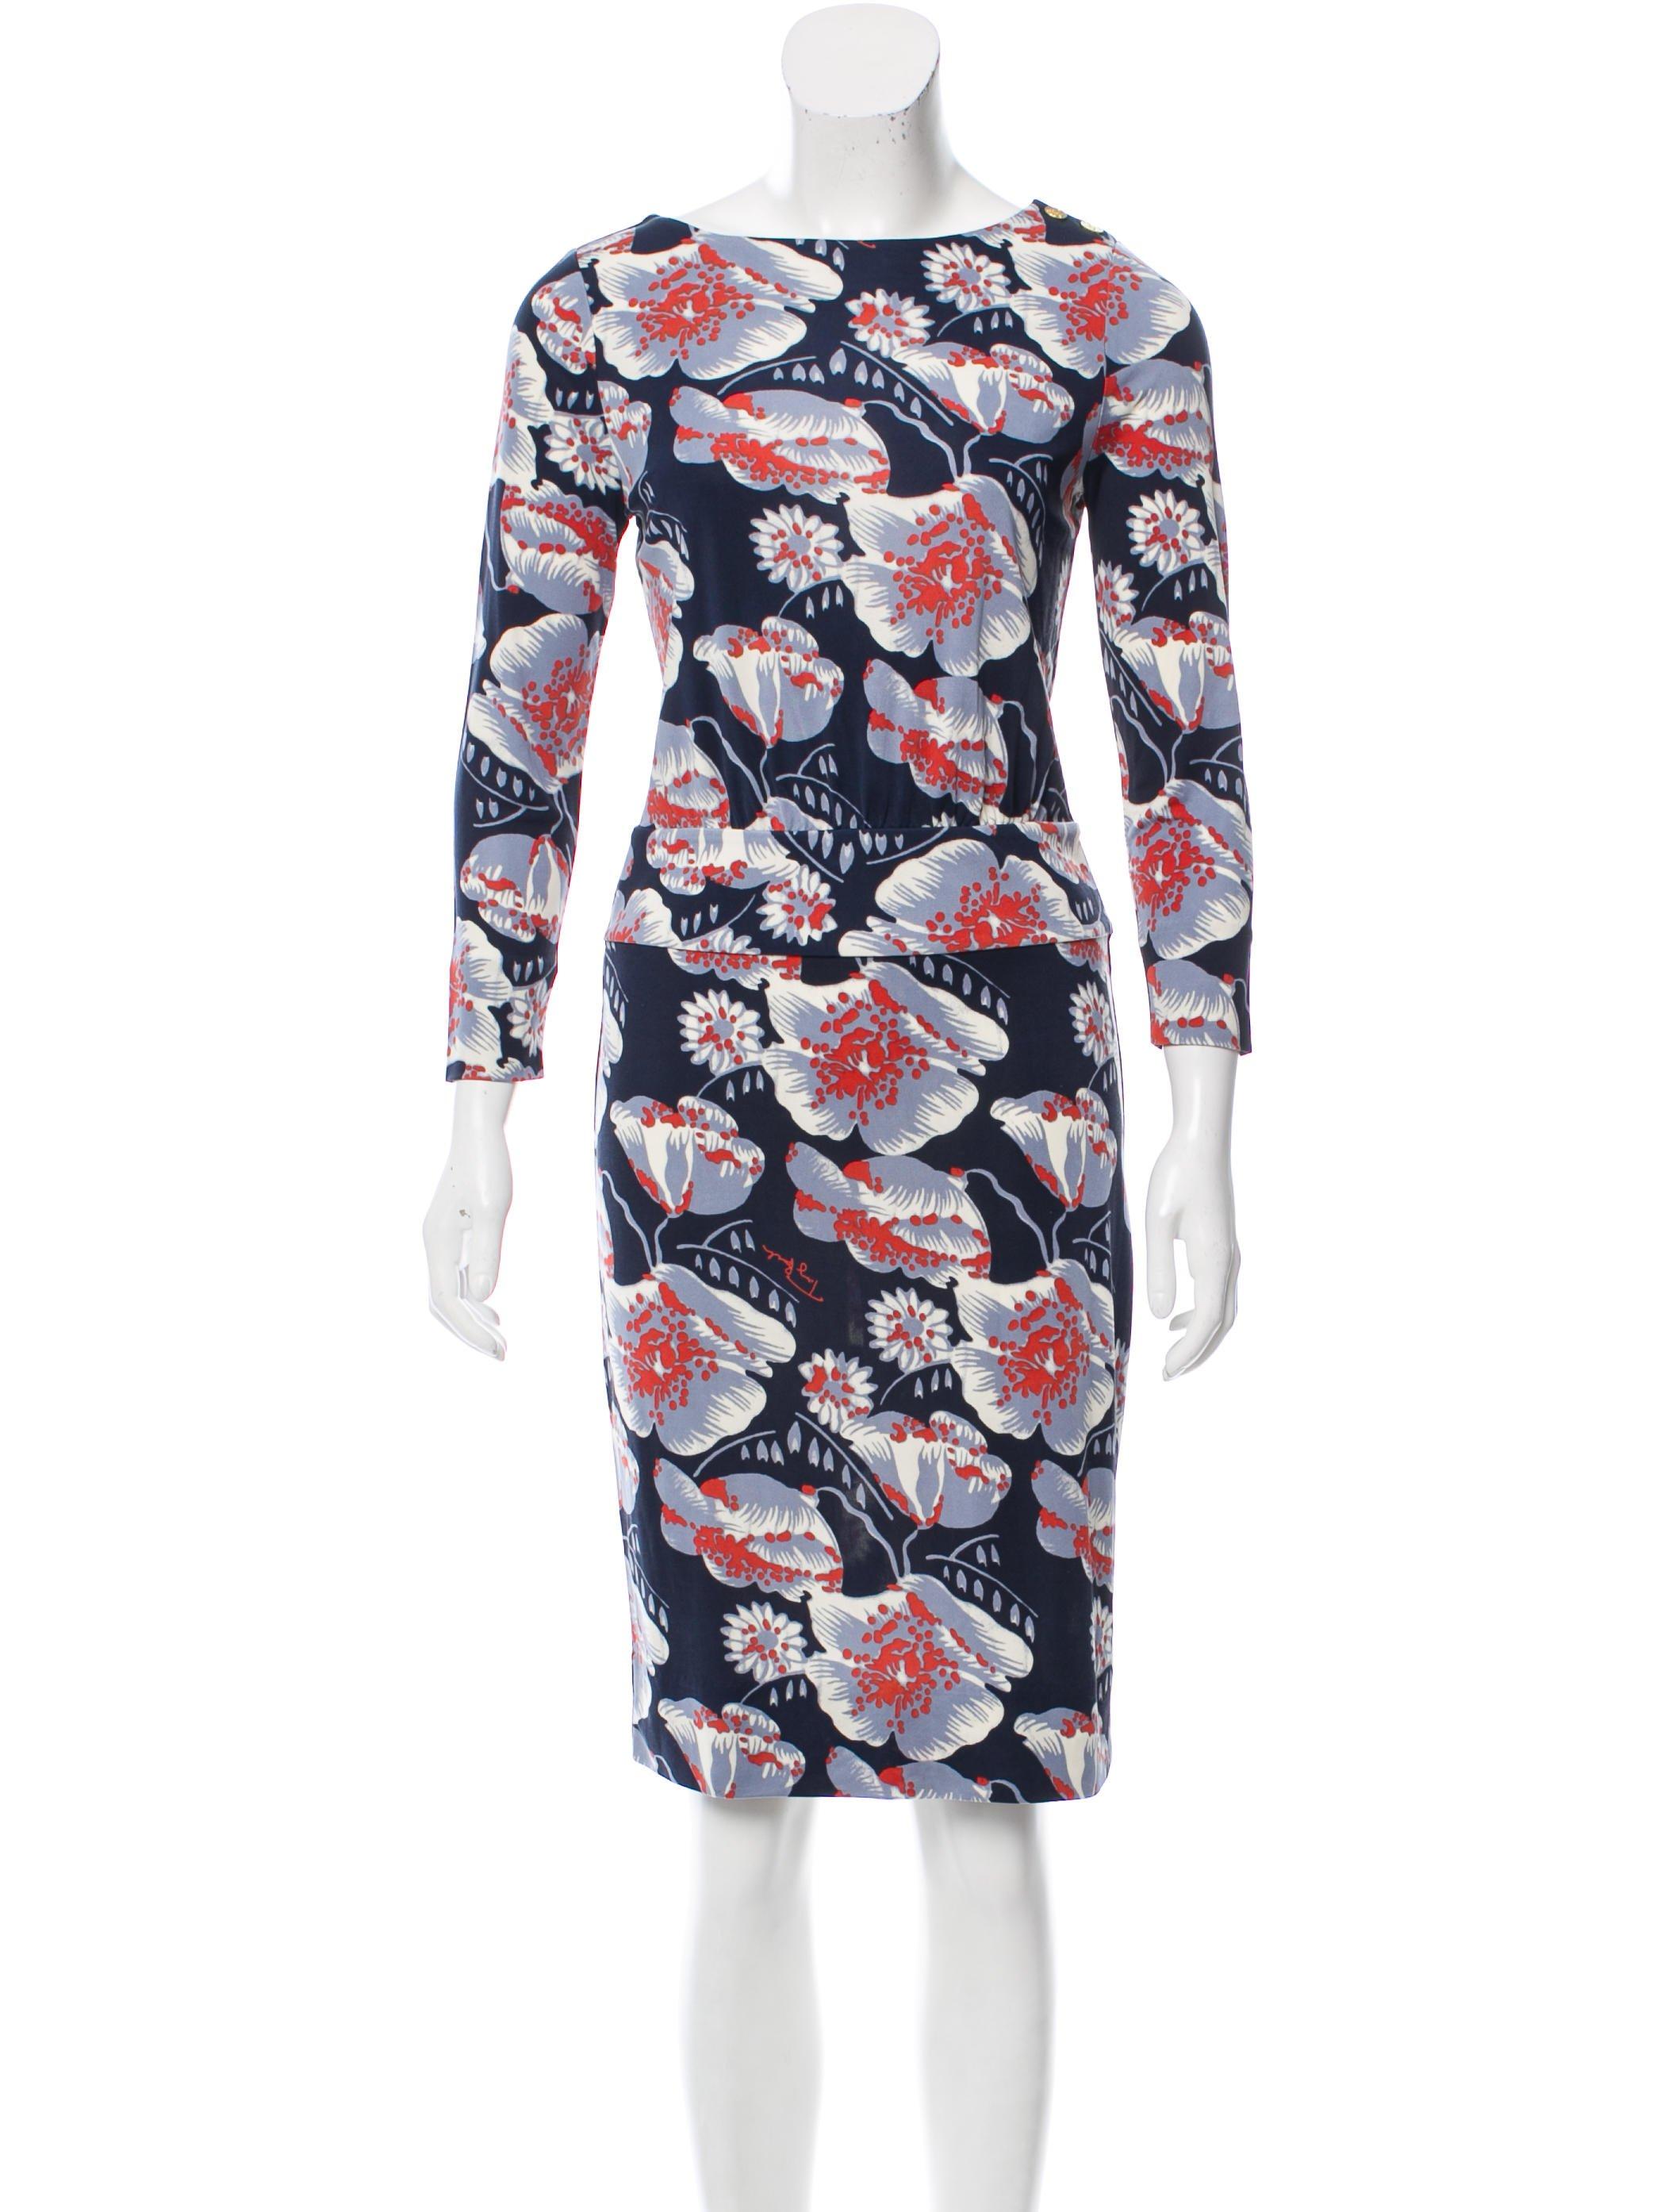 994882f1546e99 Tory Burch Silk Printed Dress w  Tags - Clothing - WTO111789